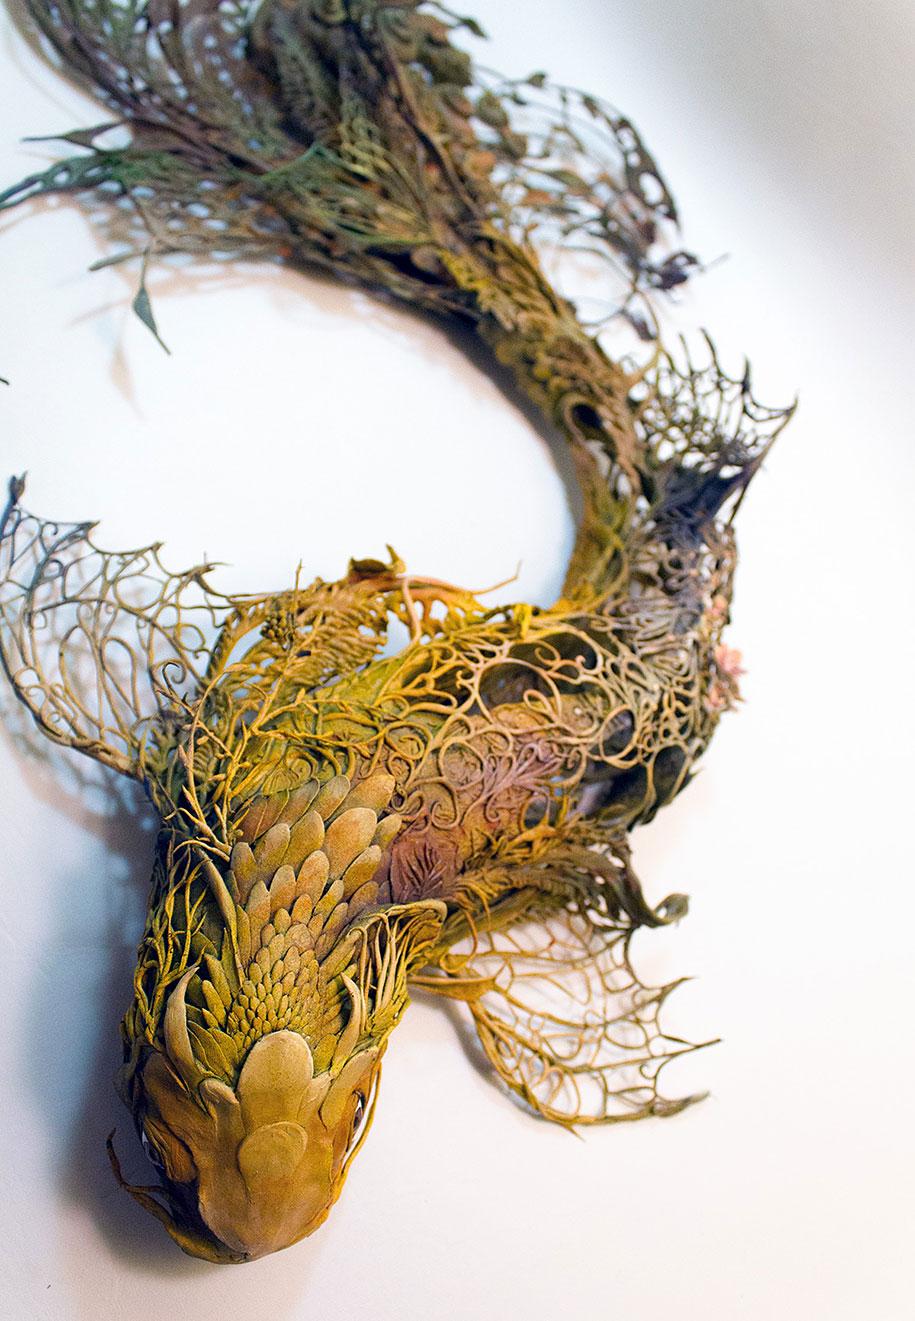 animal-plant-fusion-combination-sculpture-ellen-jewett-03